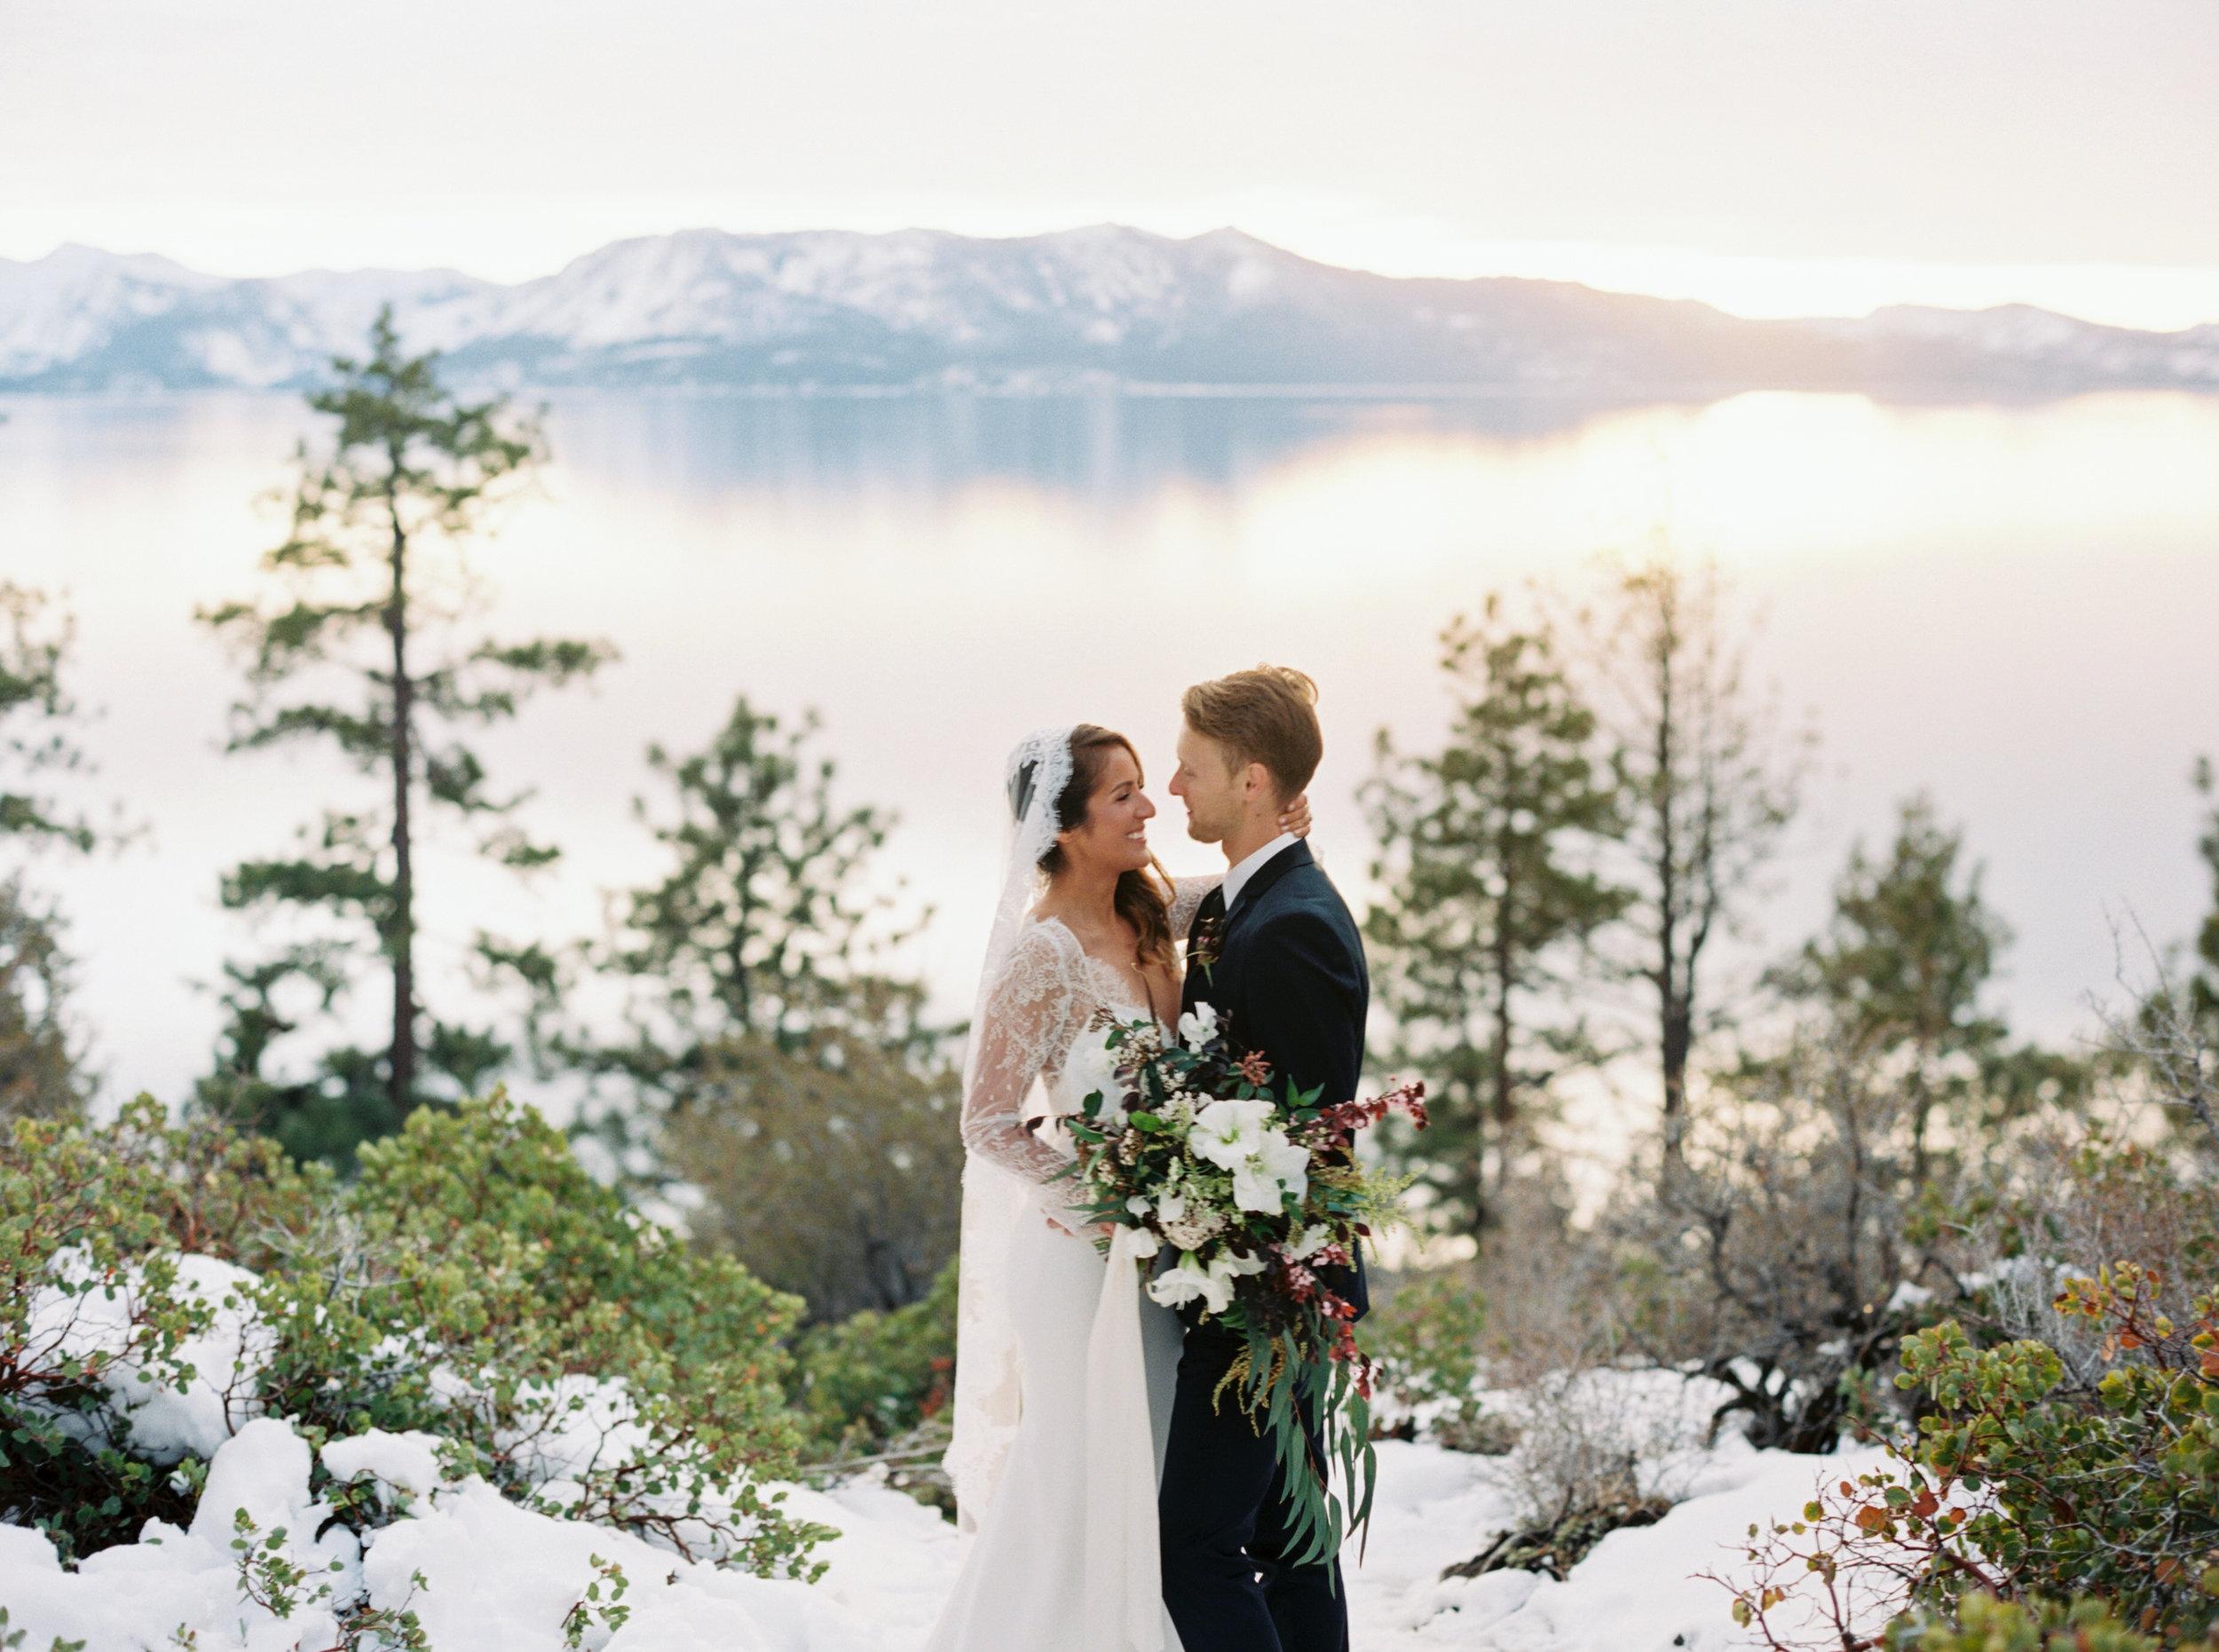 Logan's Shoals Winter Elopement - Coston & Co. - Lake Tahoe, NV